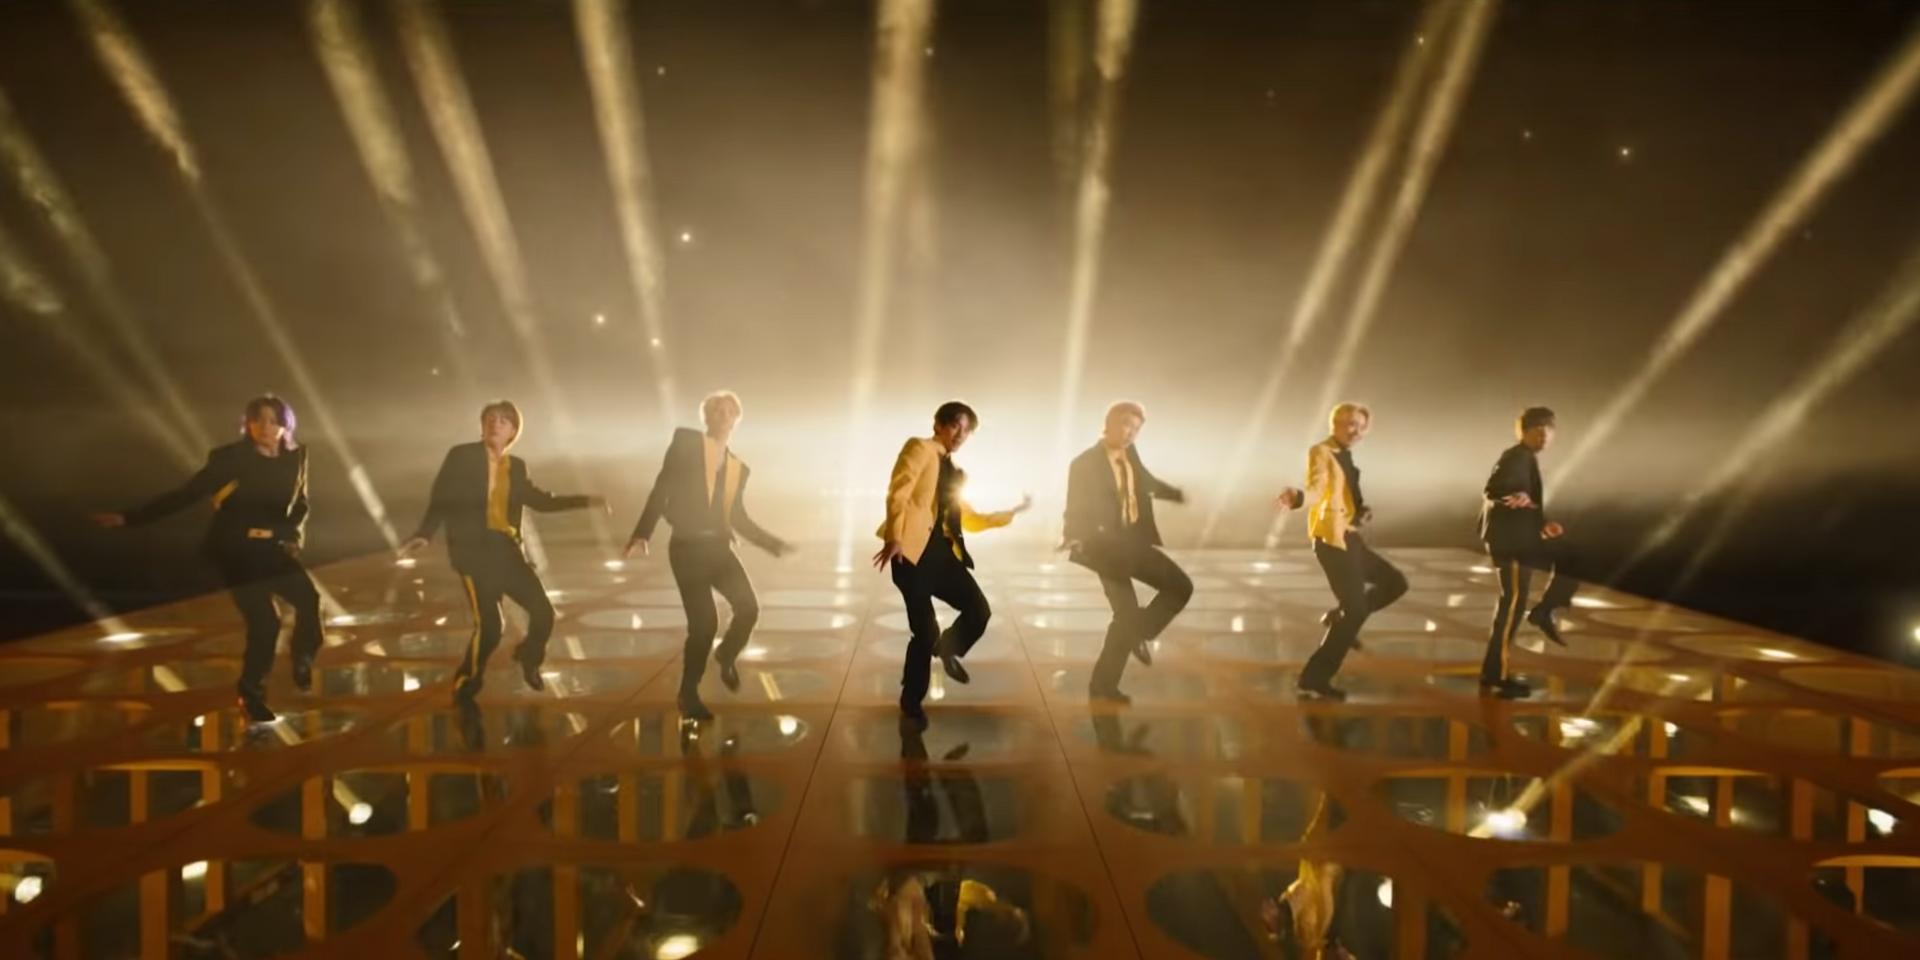 BTS' new single 'Butter' breaks 20 Guinness World Records on release